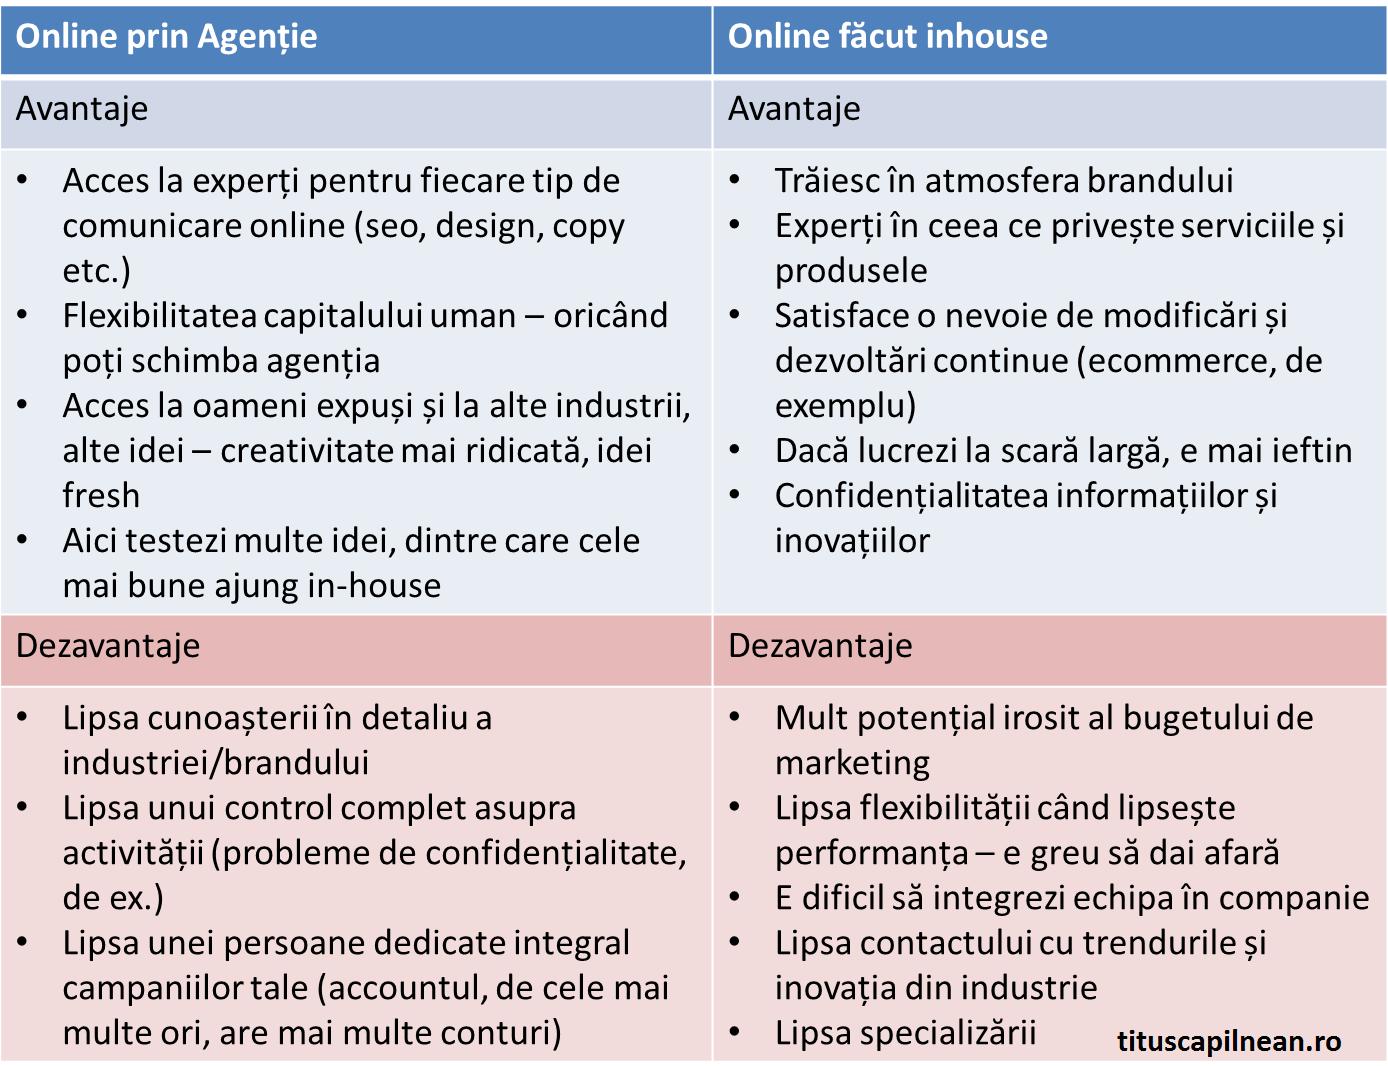 Online făcut inhouse vs. Online făcut prin agenție